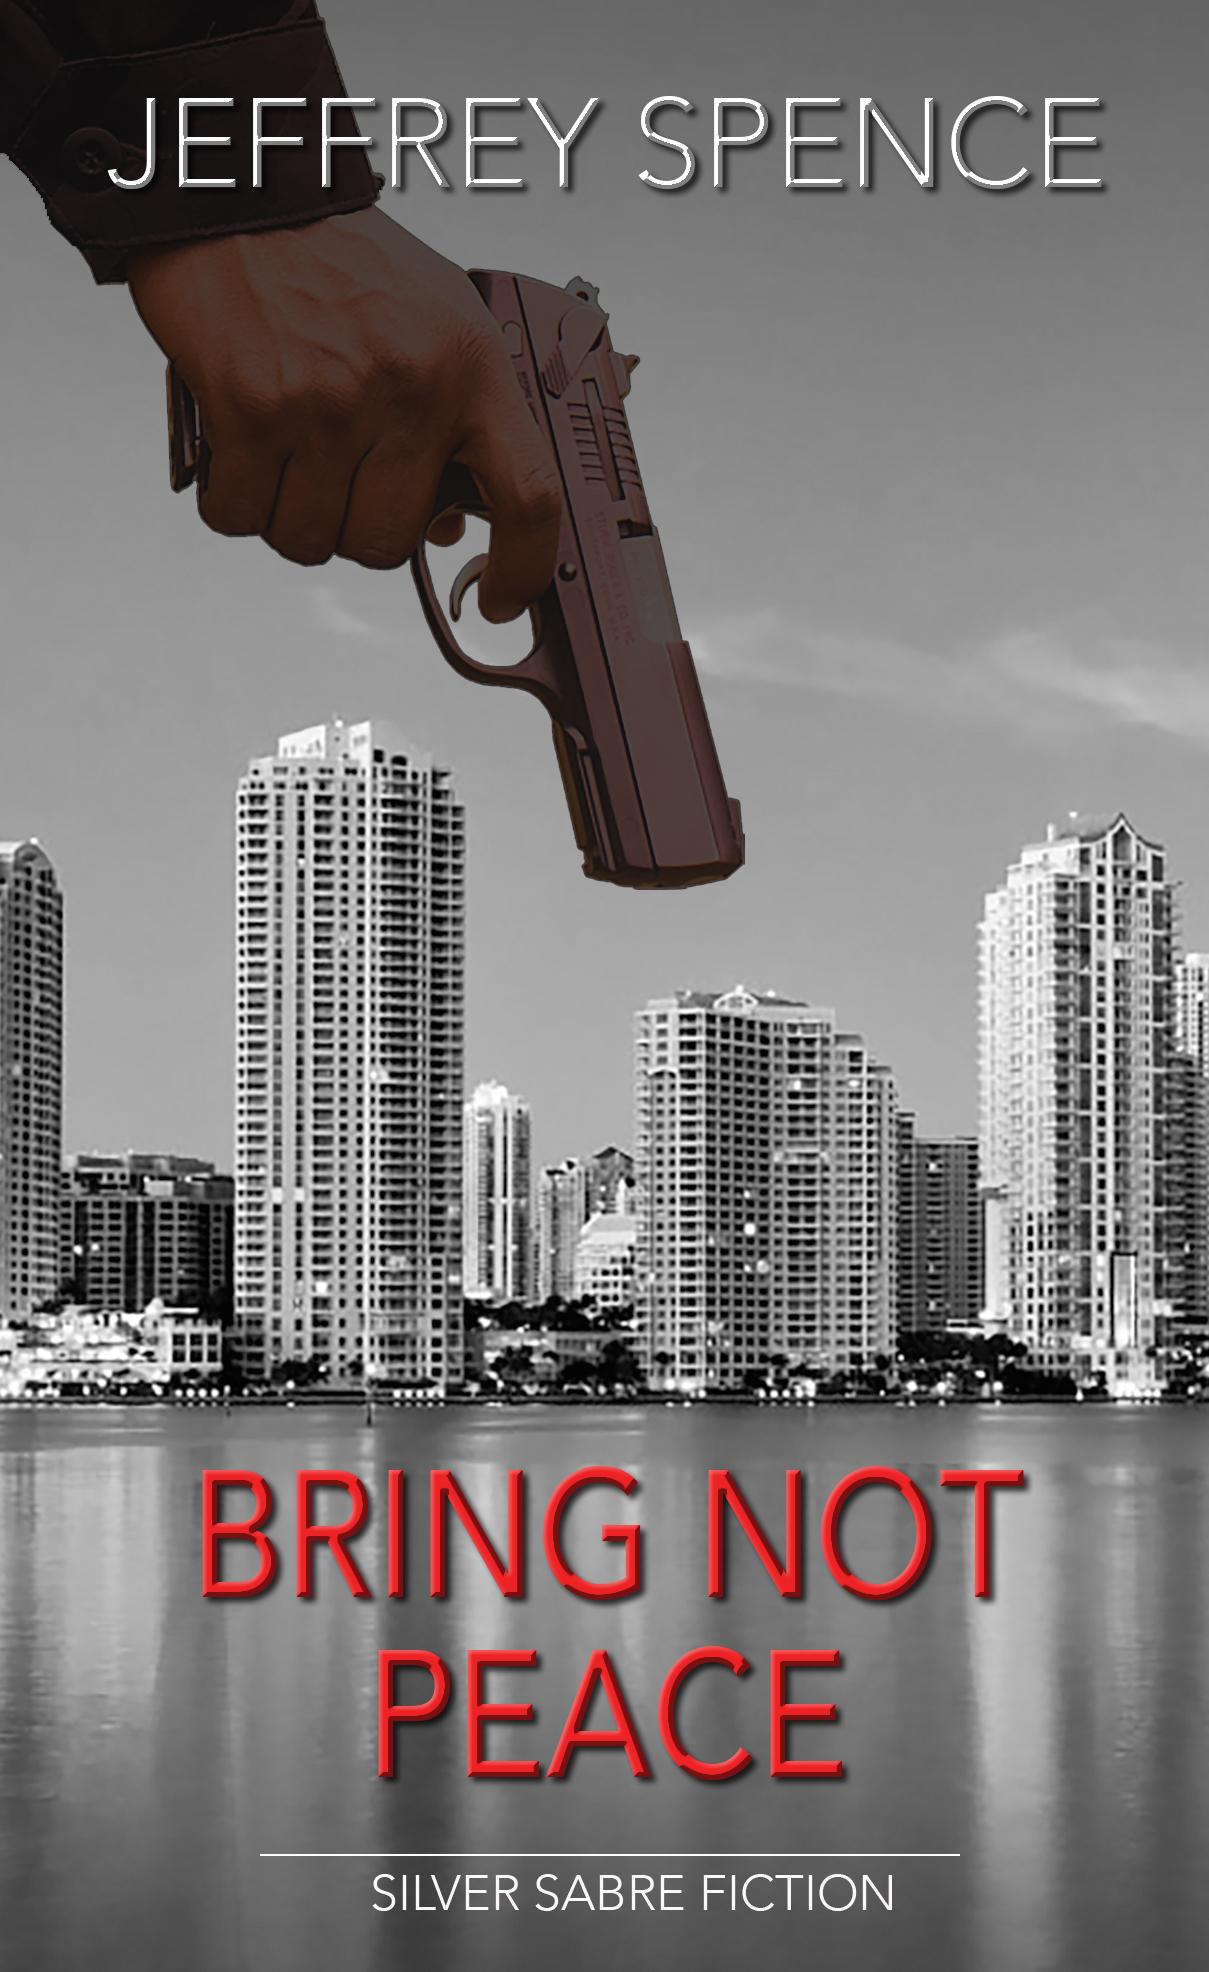 IDT03 5 Bring Not Peace cover eBook.jpg